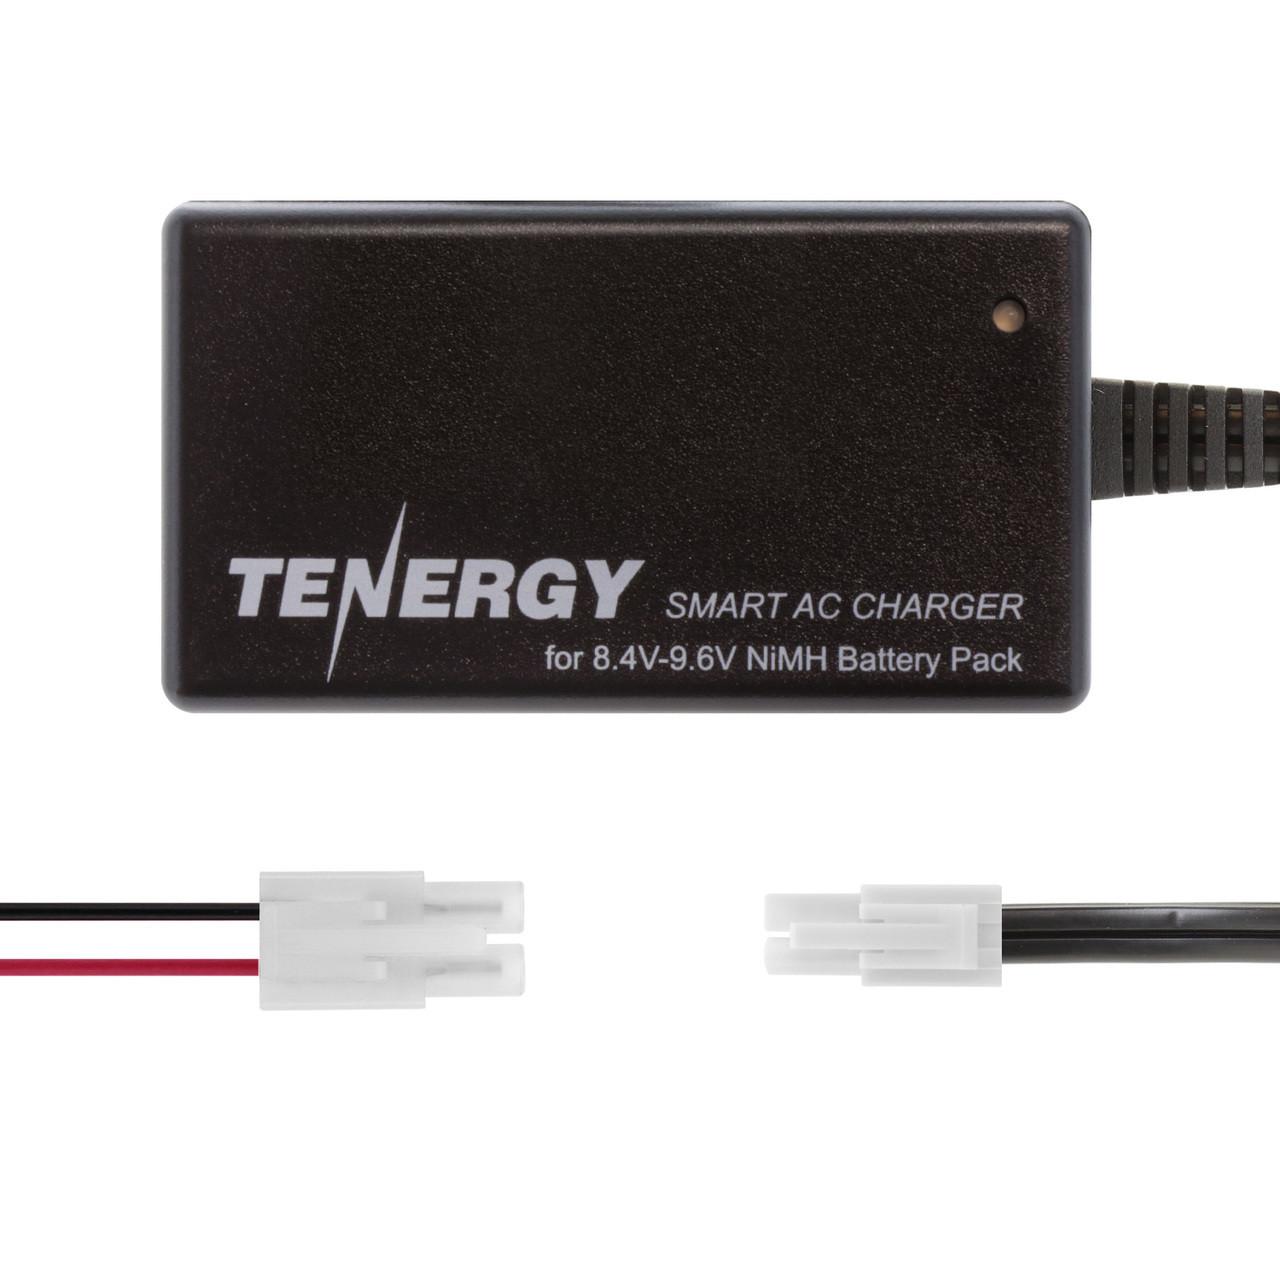 Tenergy Smart Charger for 8.4V-9.6V NiMH Airsoft & RC Battery Packs w/ Mini Tamiya Connector + Standard Tamiya Adapter